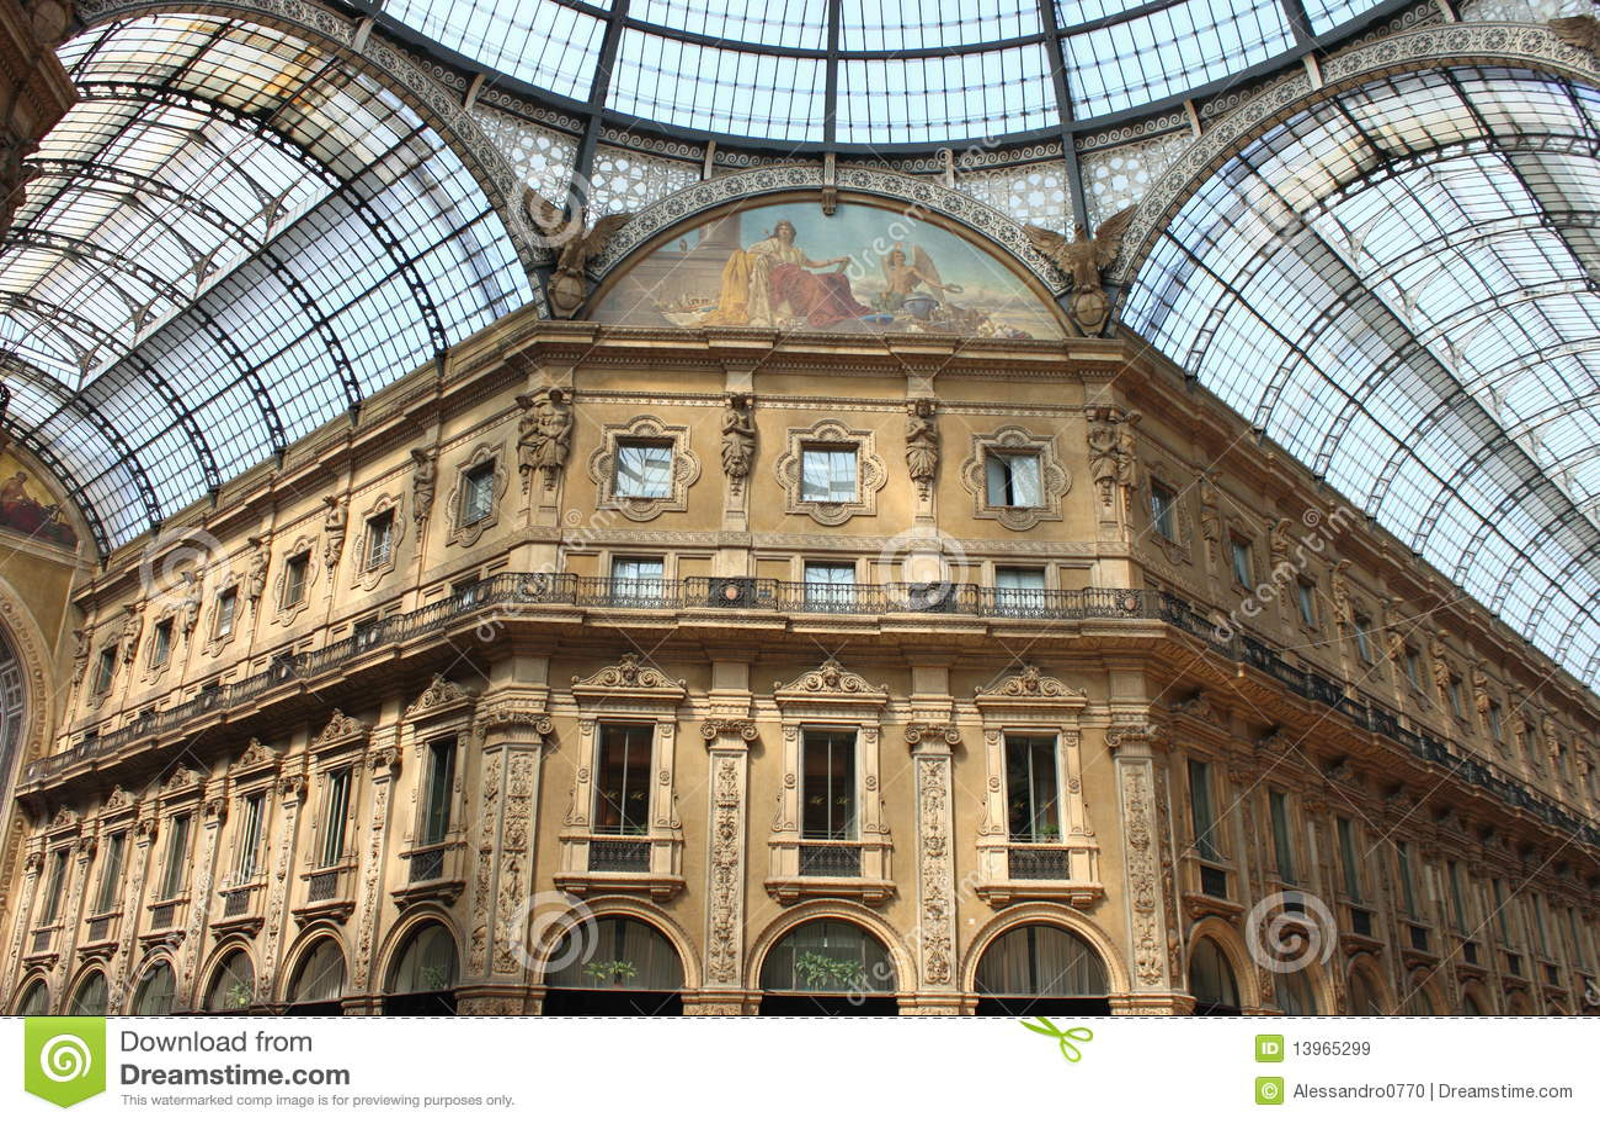 Milan Gallery Royalty Free Stock Images Image 13965299